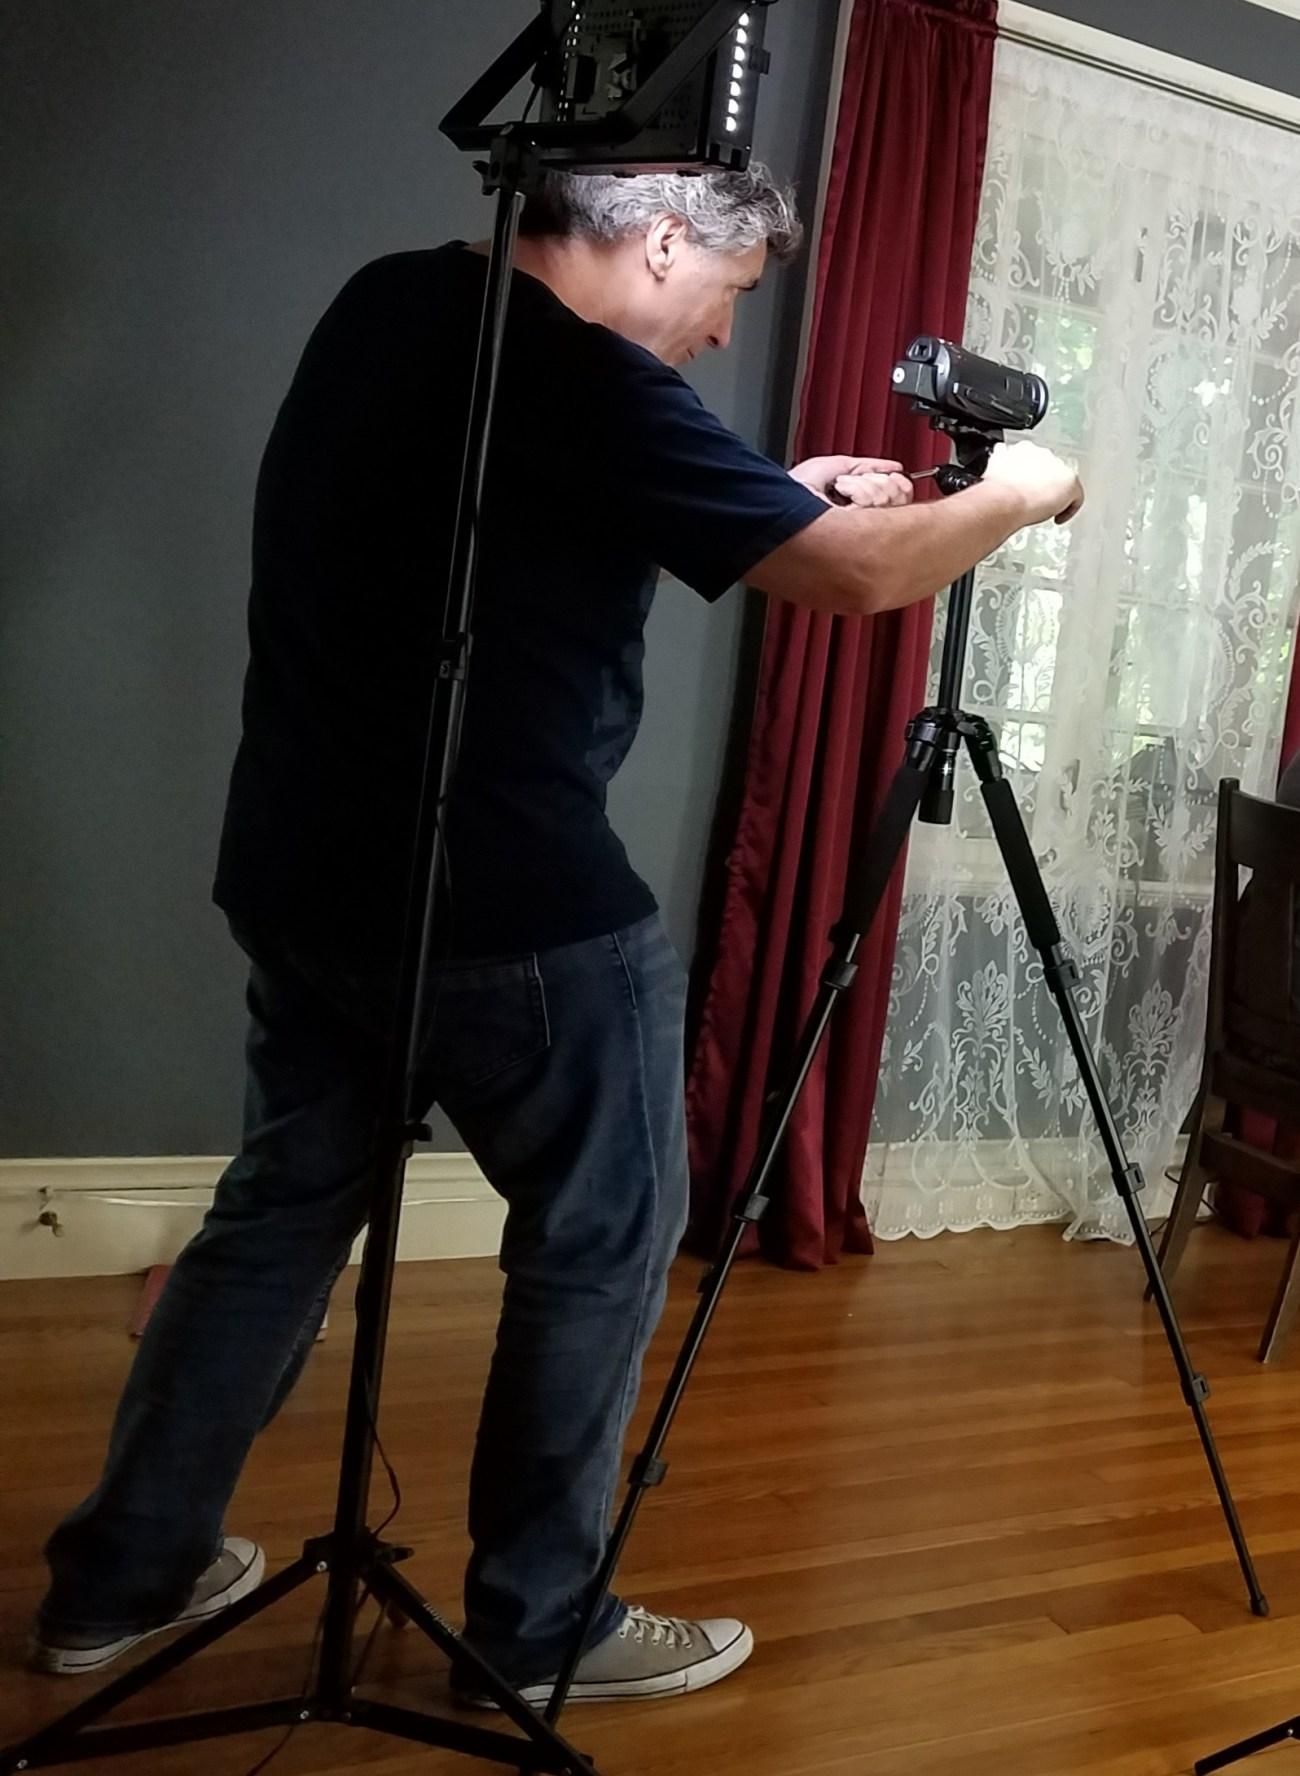 John Osborne spanks, John Osborne spanking video producer, madameSamanthaB interviews, MadameSamanthaB spanks, aaaspanking.com, spankingblogg.com,